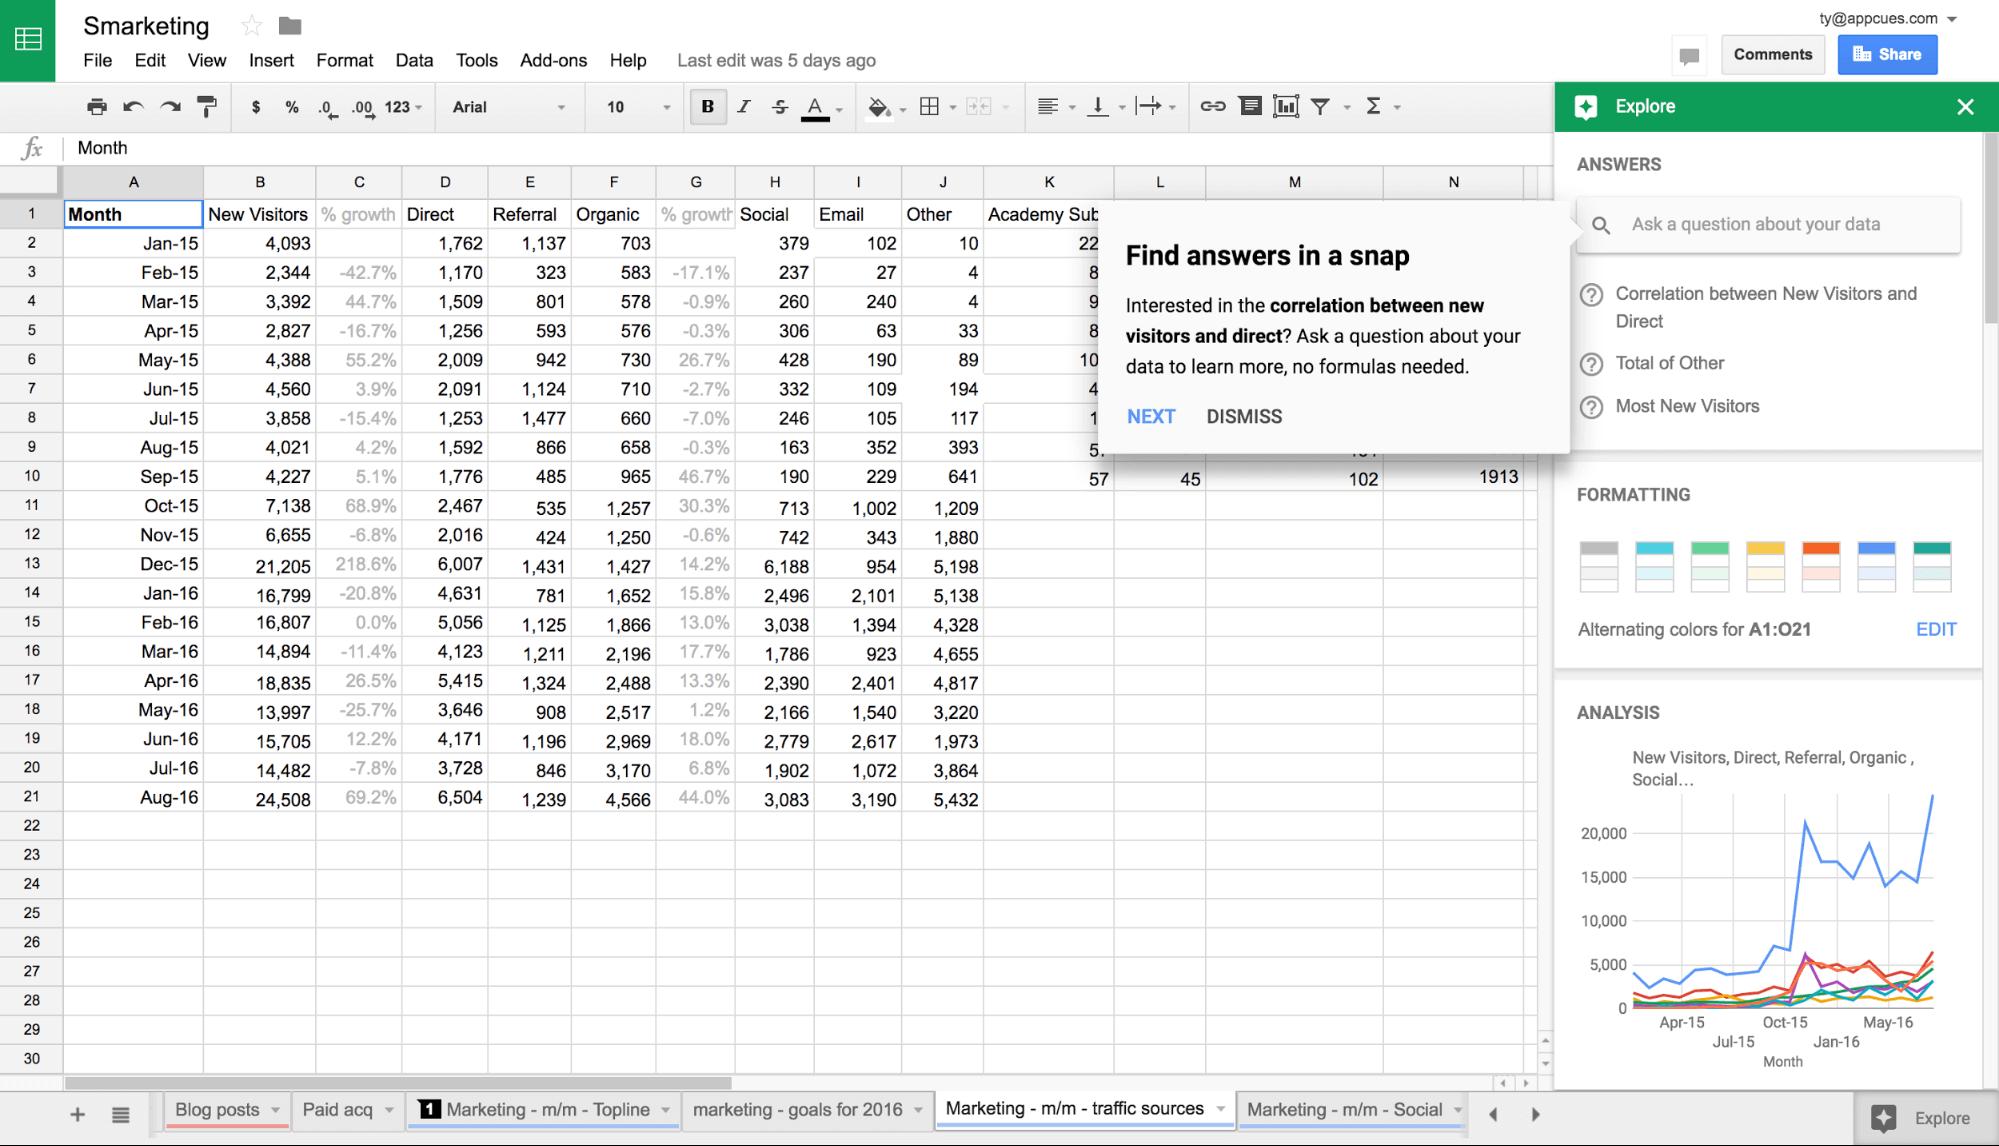 Smarketing spreadsheet find answers